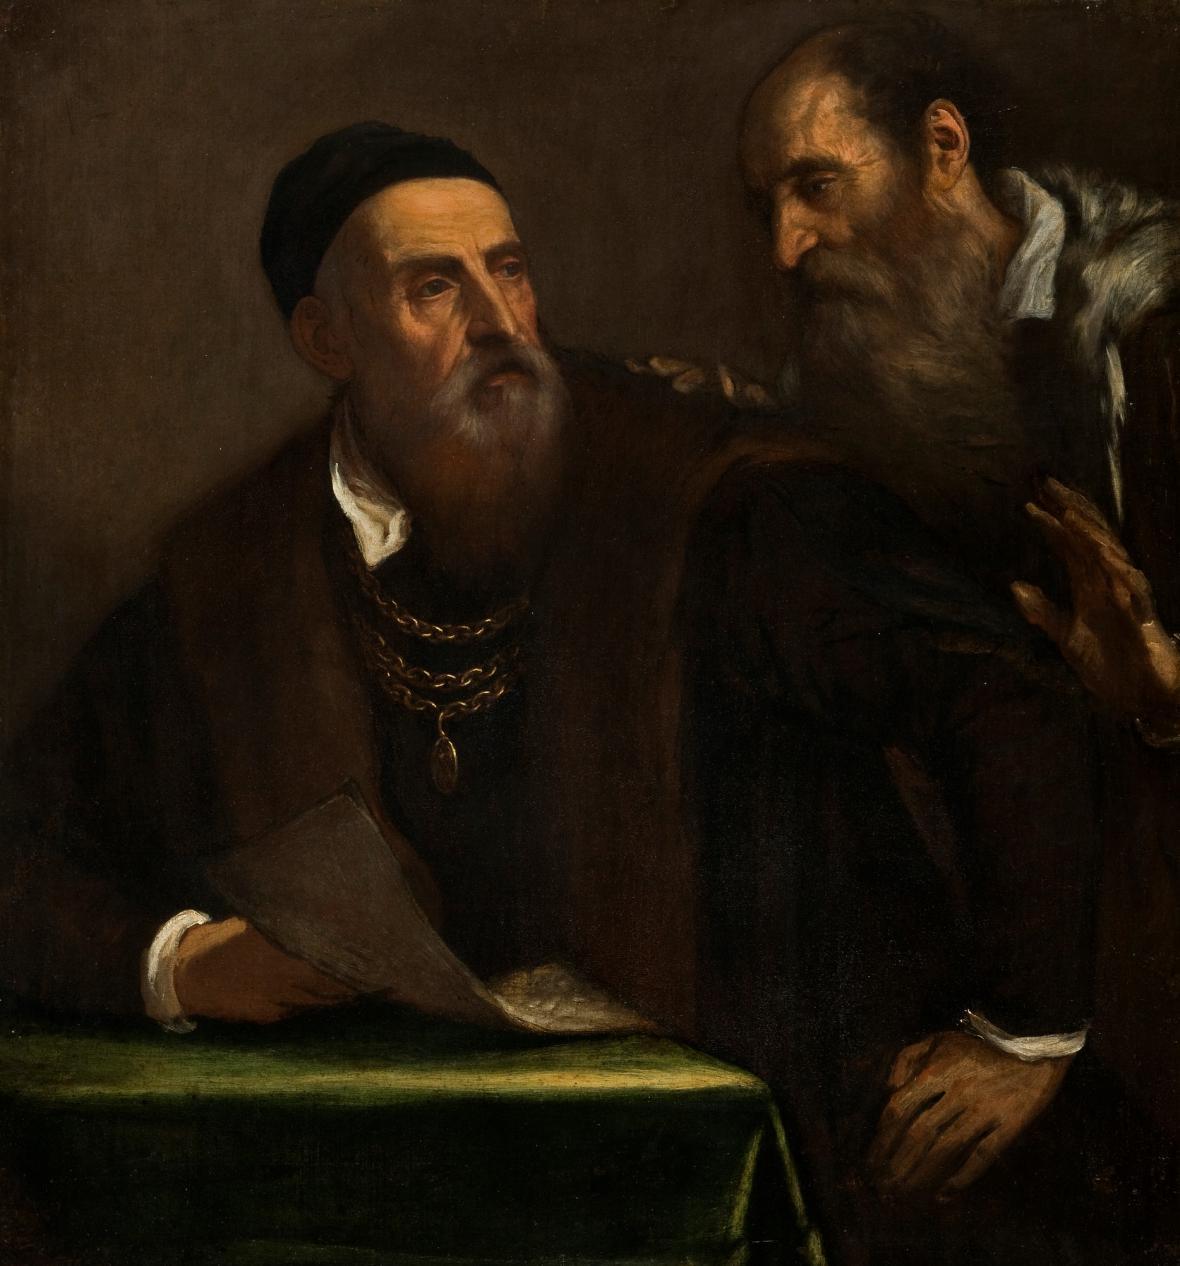 Autoportrét Tiziana s Francescem Zuccato